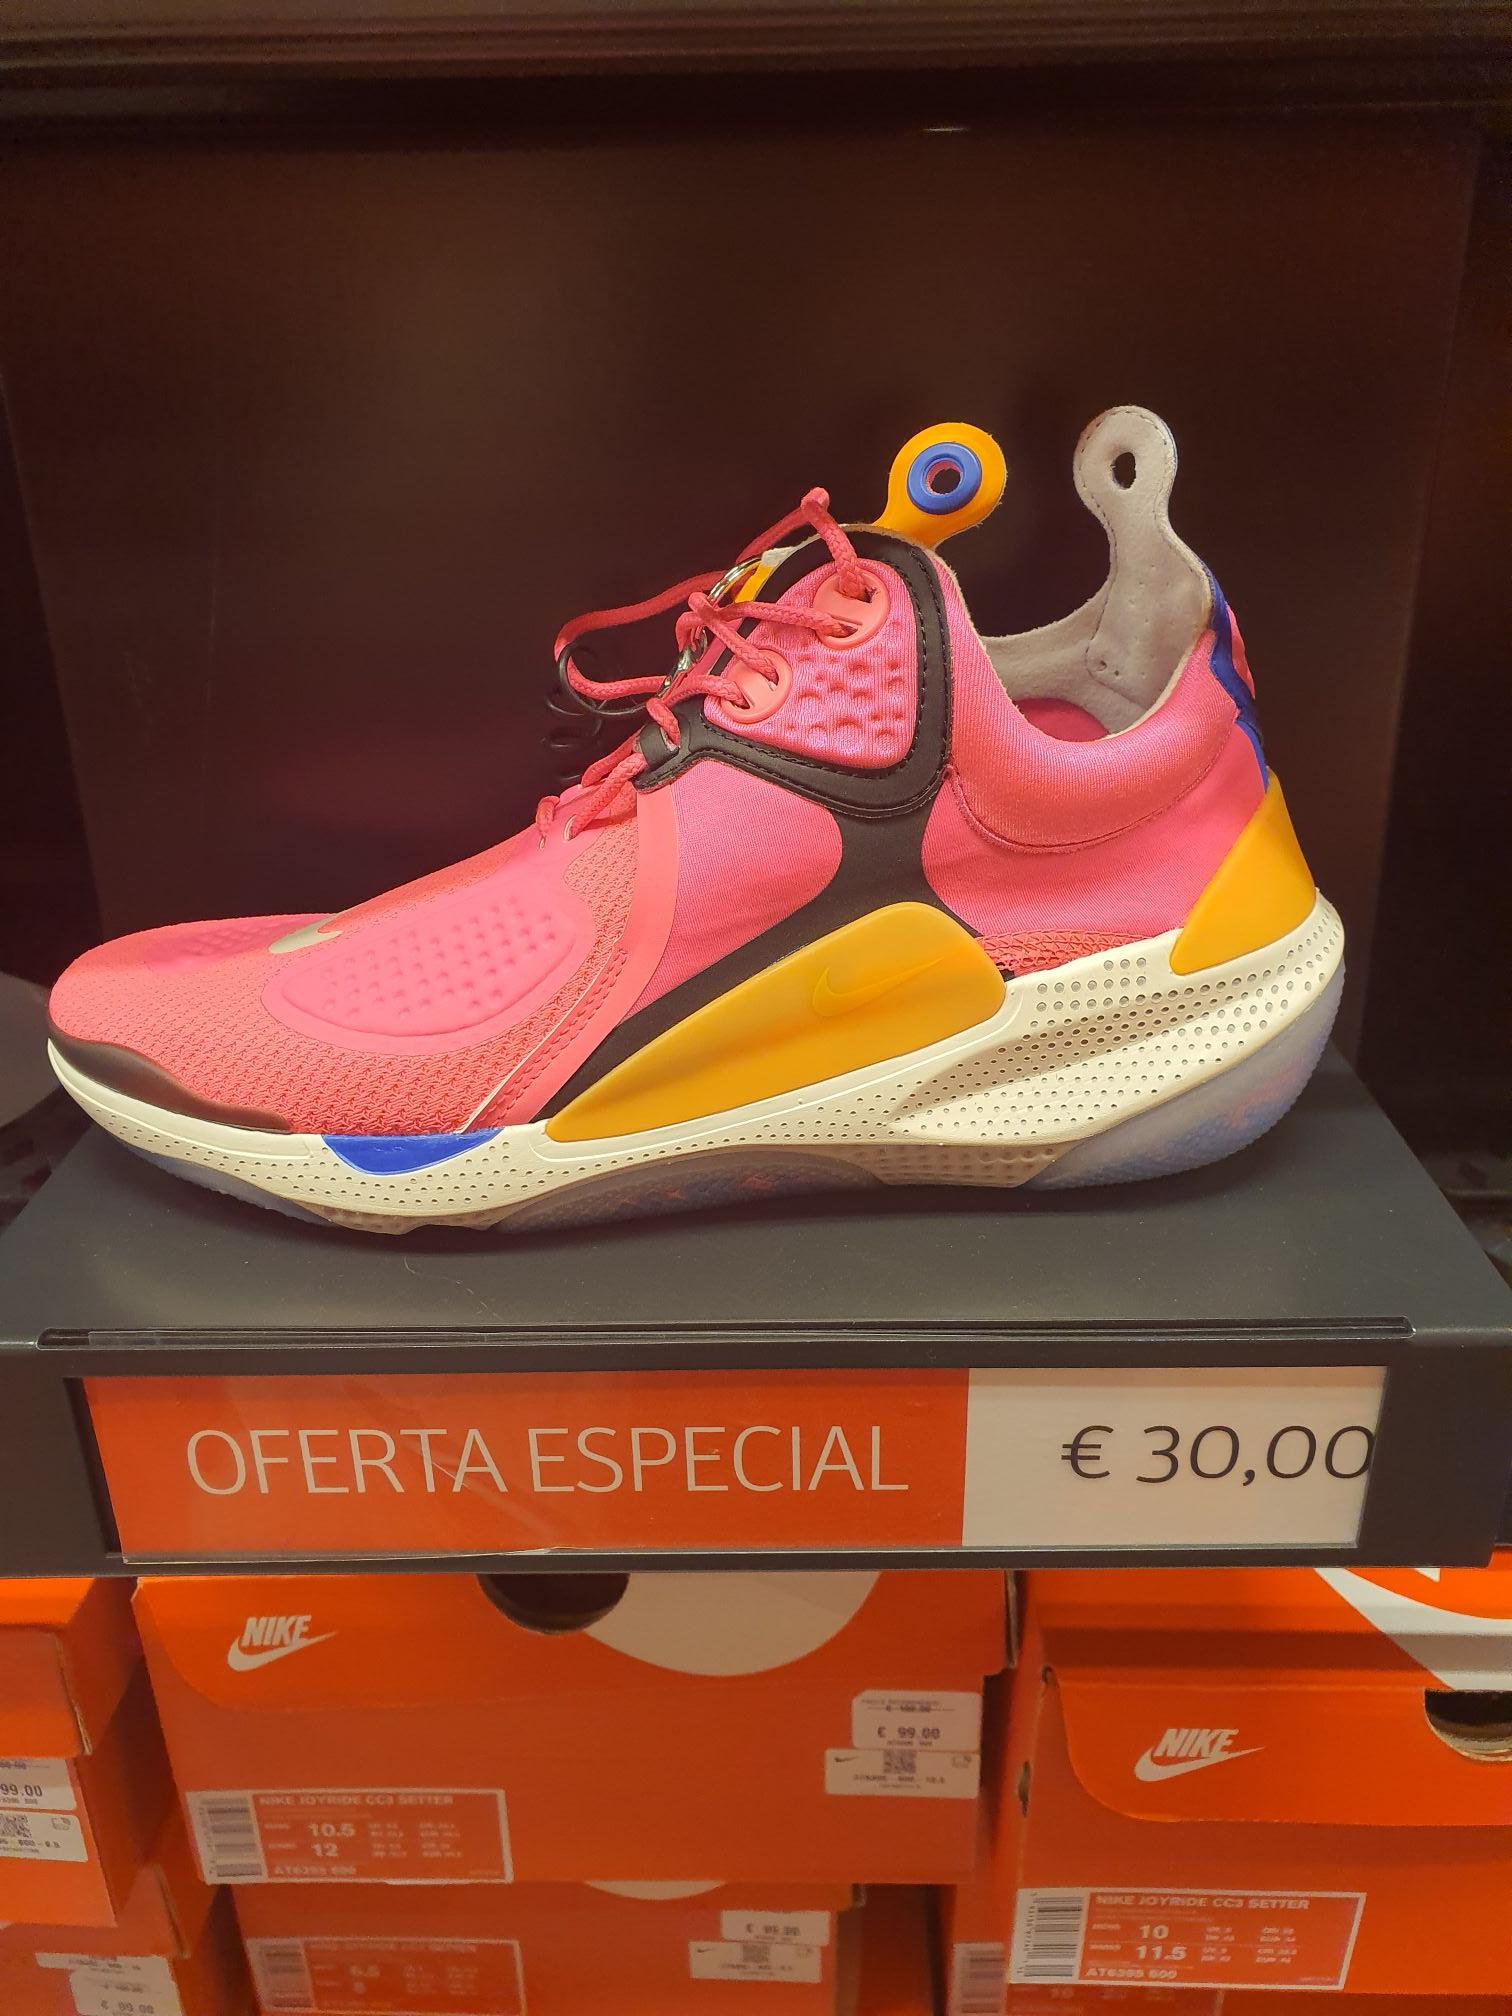 Nike joyride rosas en nike factory Alcorcón Madrid